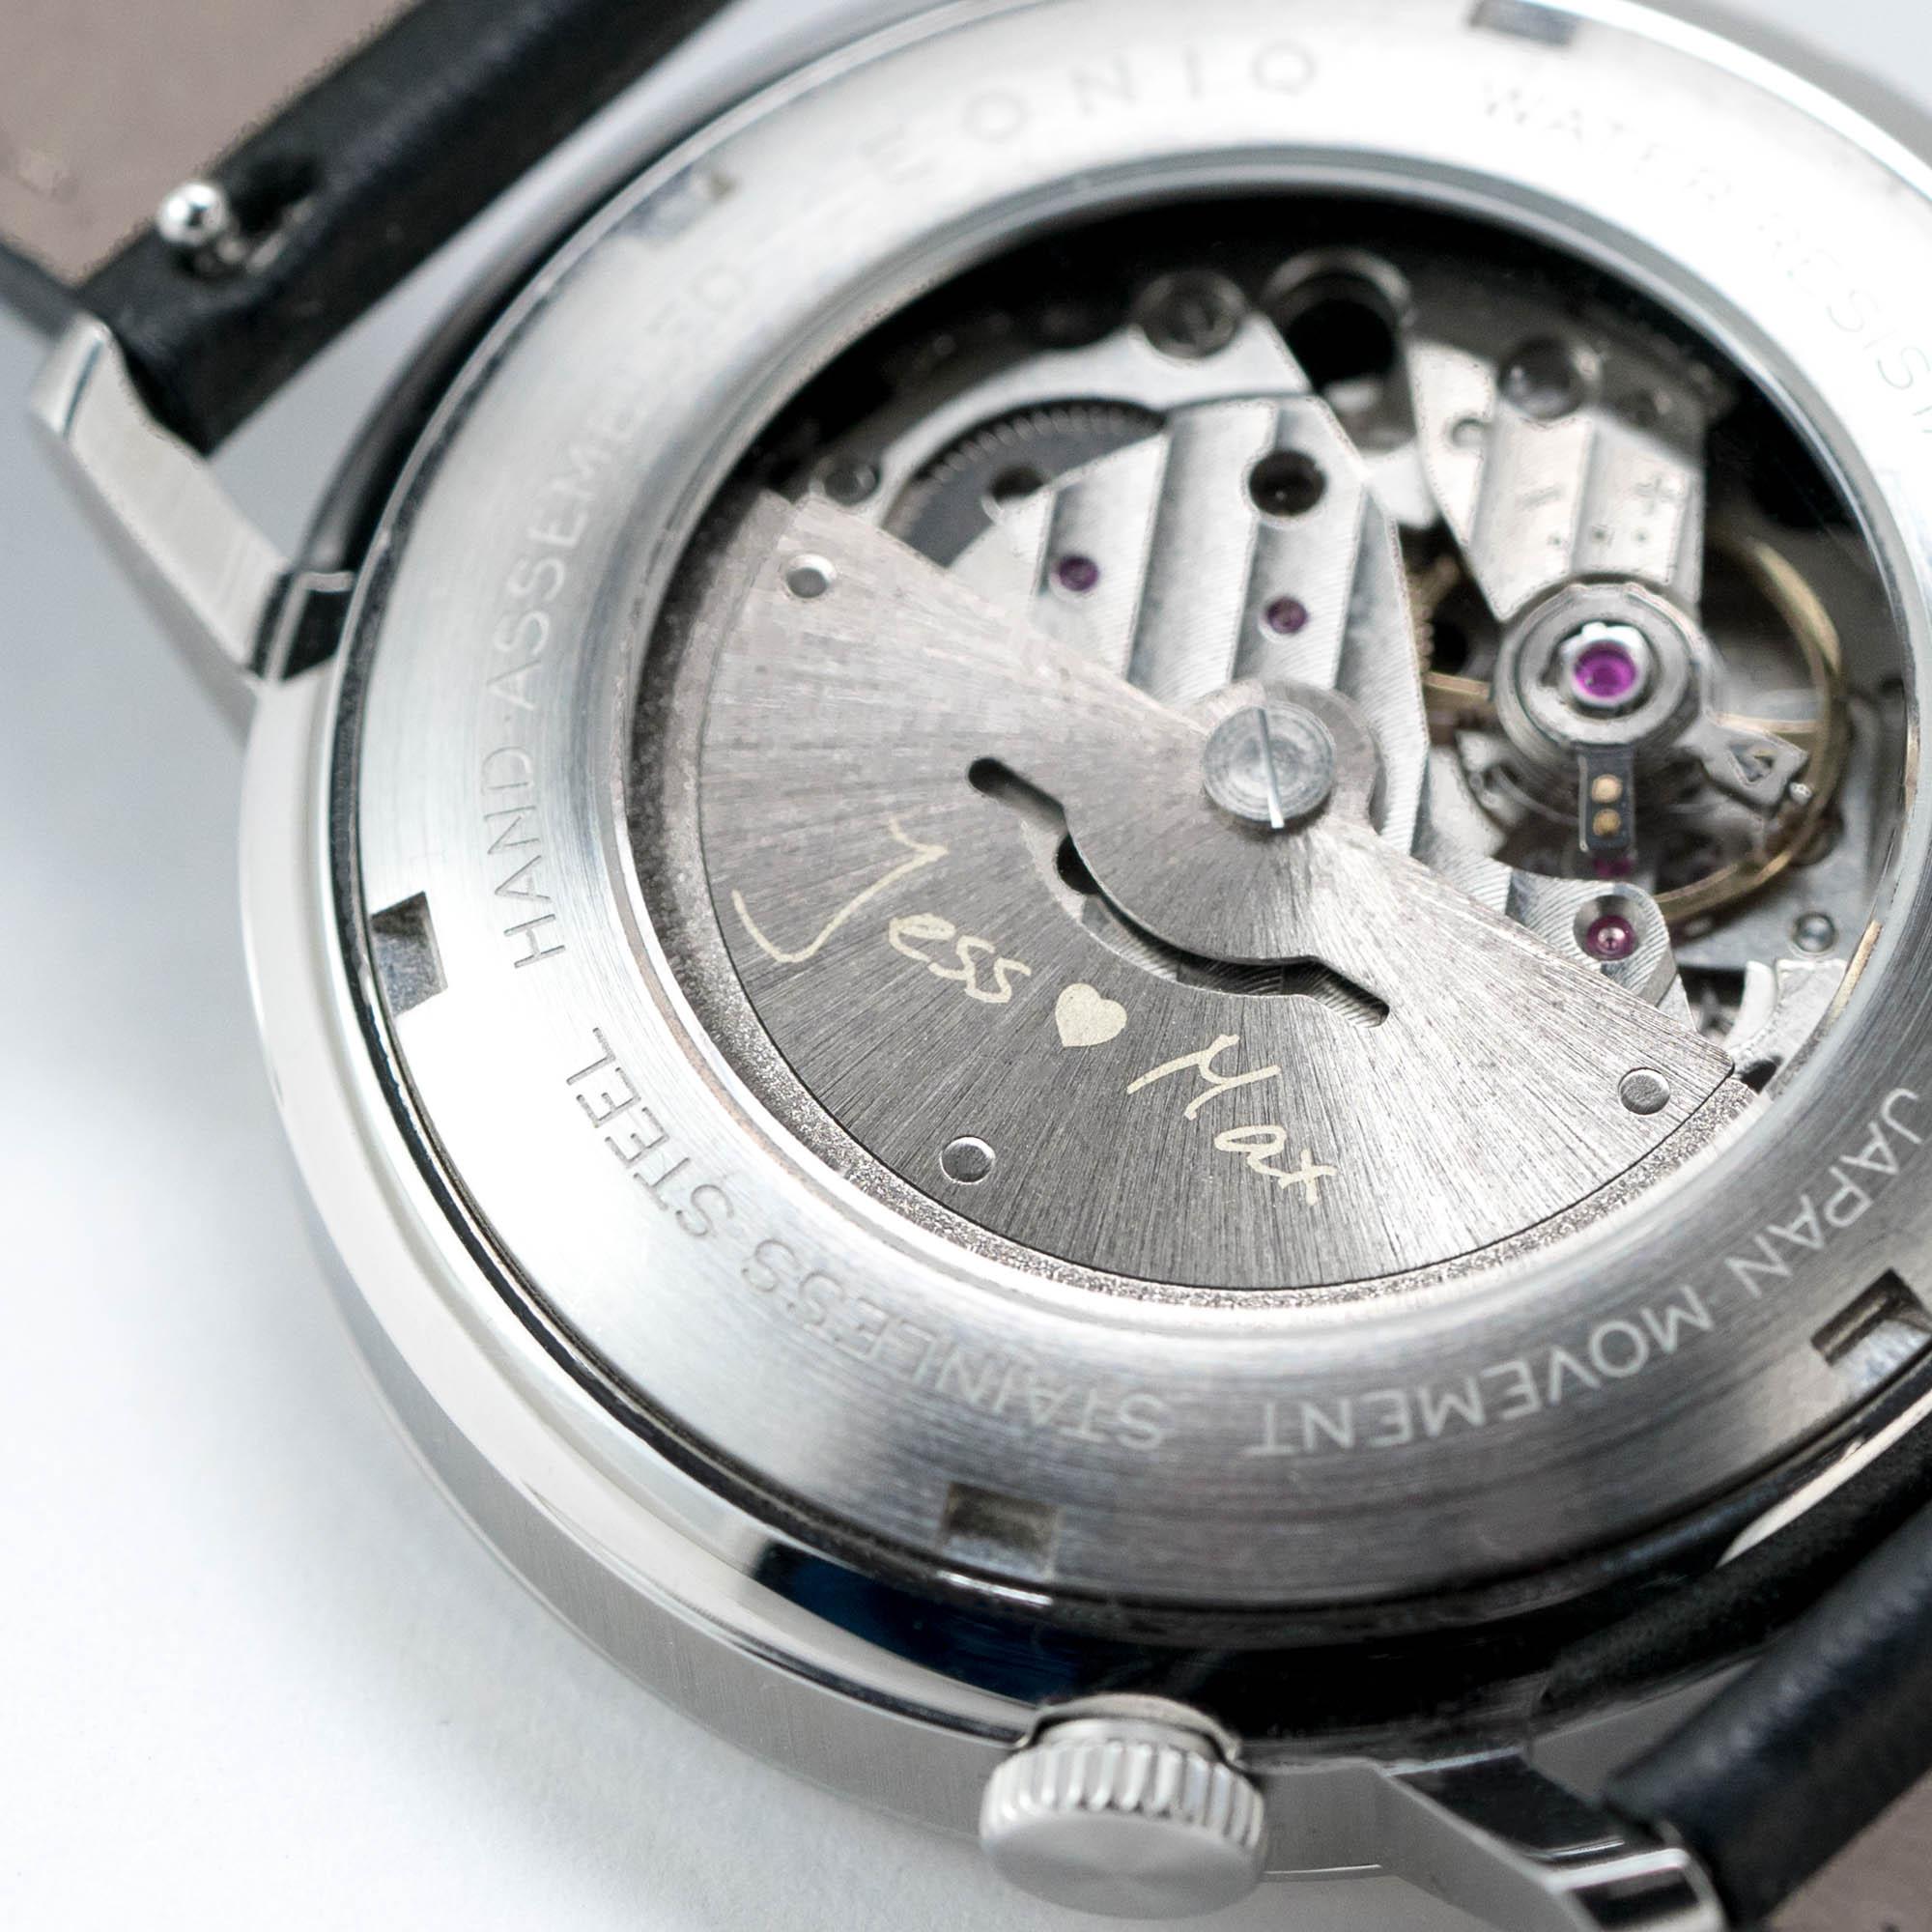 True Personalization - Rotor Engraving